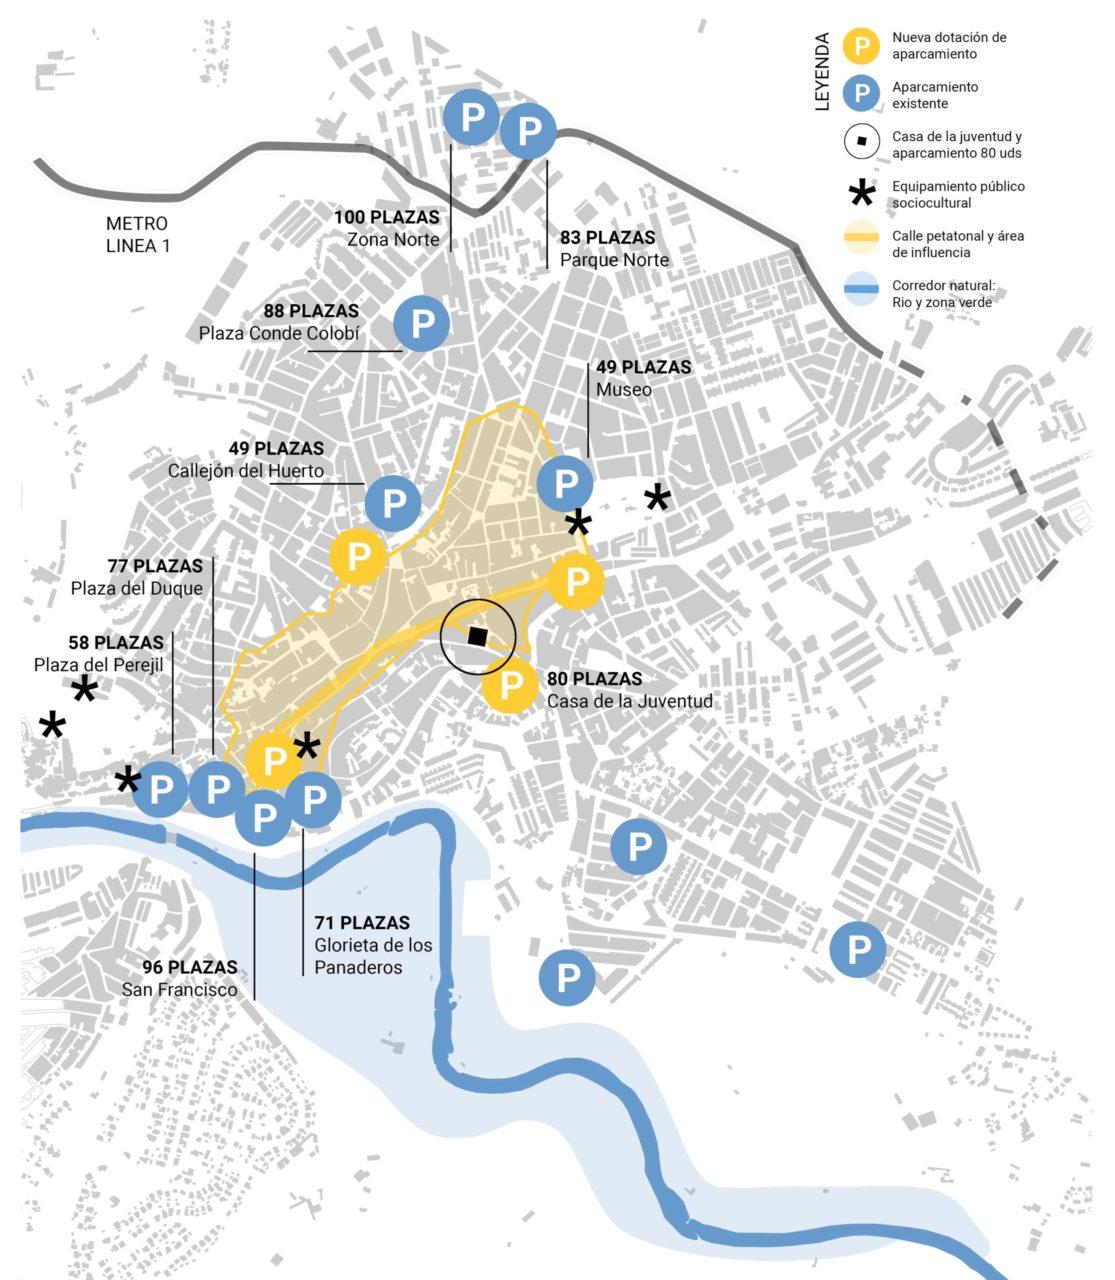 Plano cartográfico de ubicación